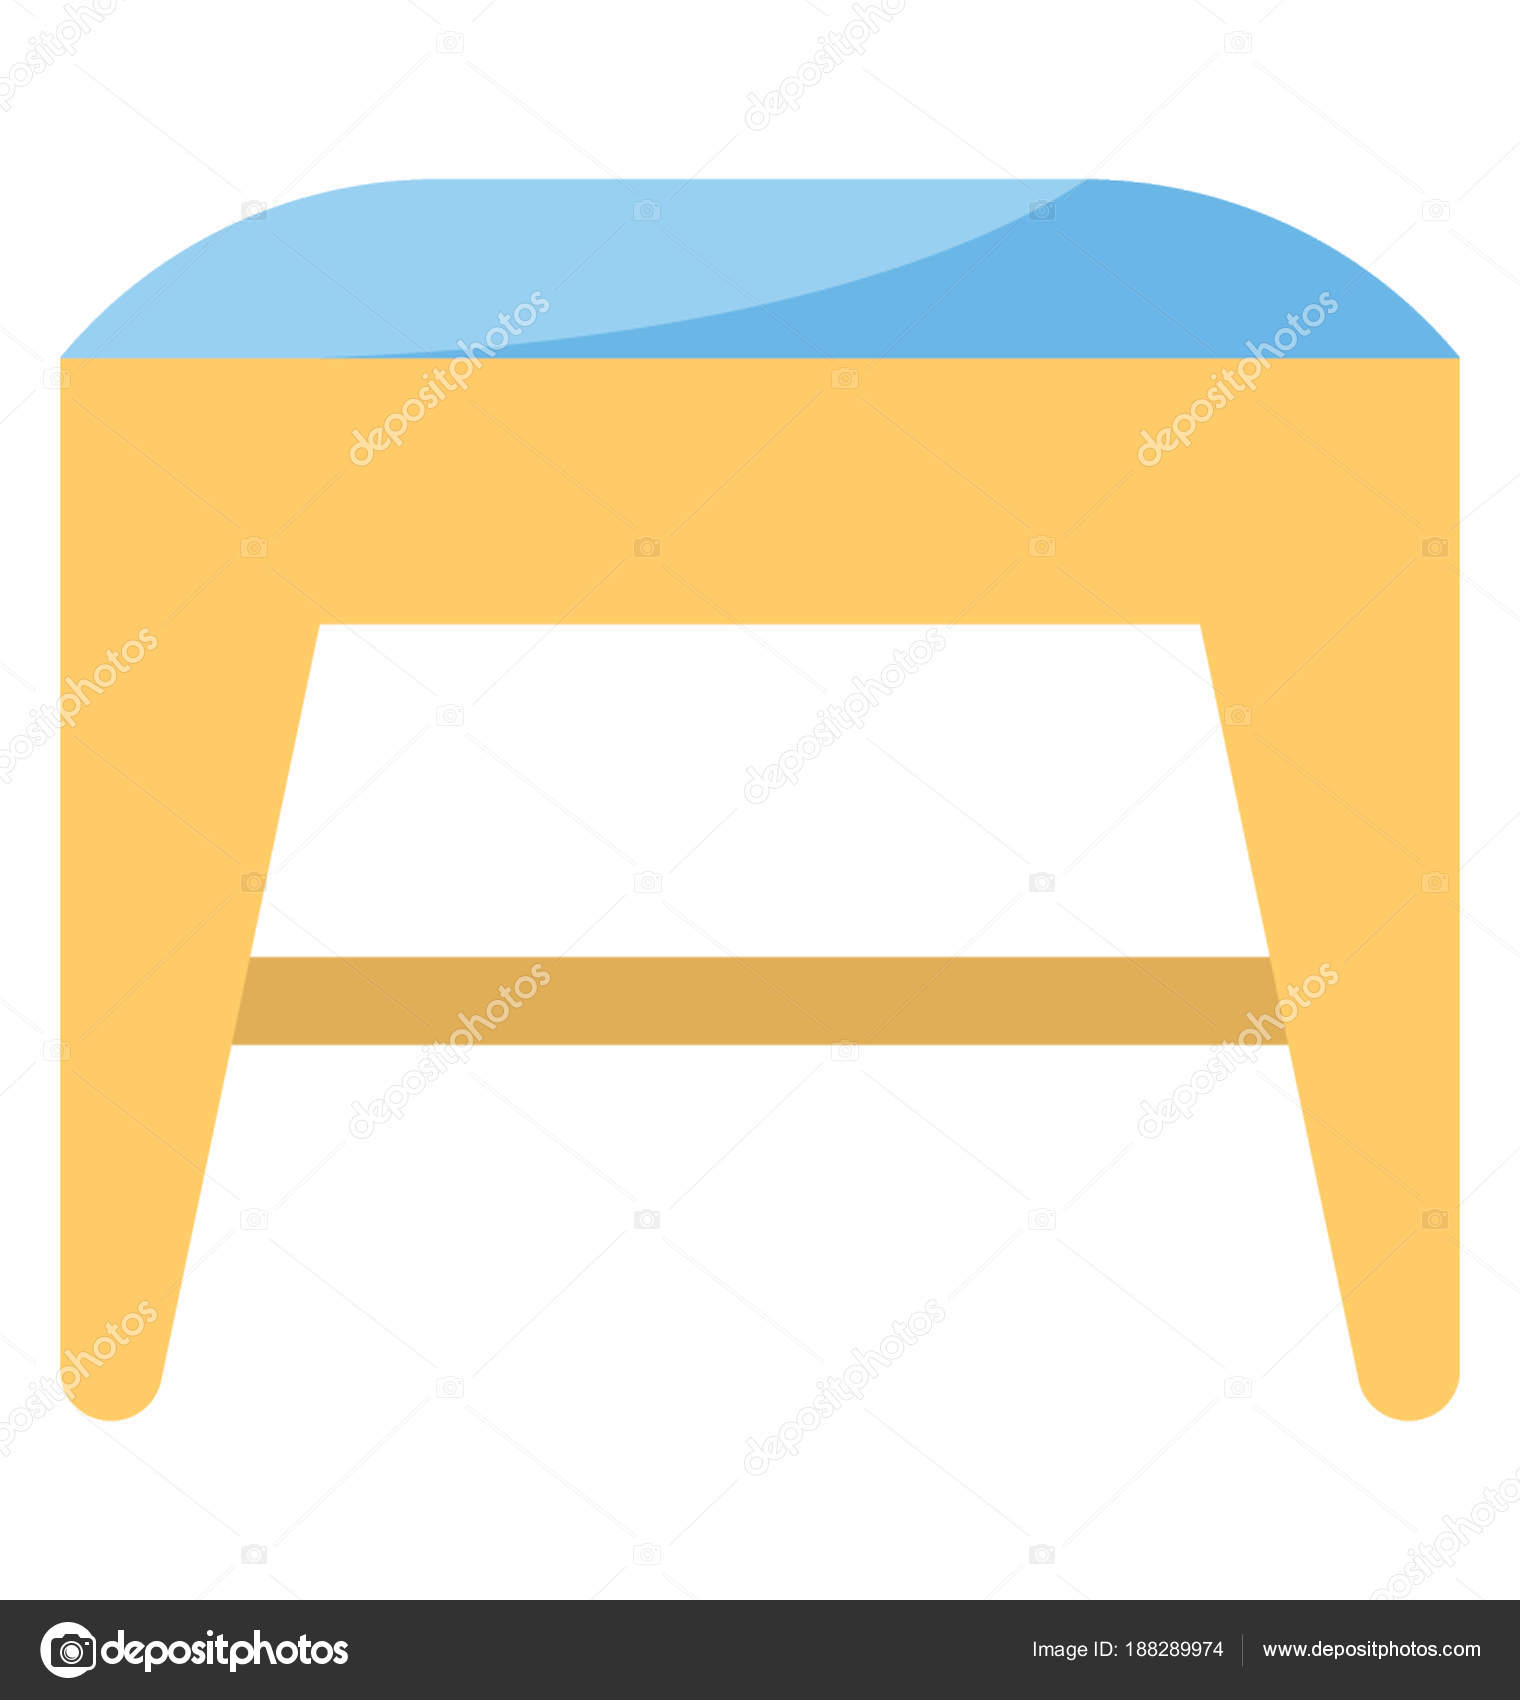 kitchen counter stools storage solutions 用于梳妆台前或厨房柜台设置的低高度凳子 图库矢量图像 c creativestall 图库矢量